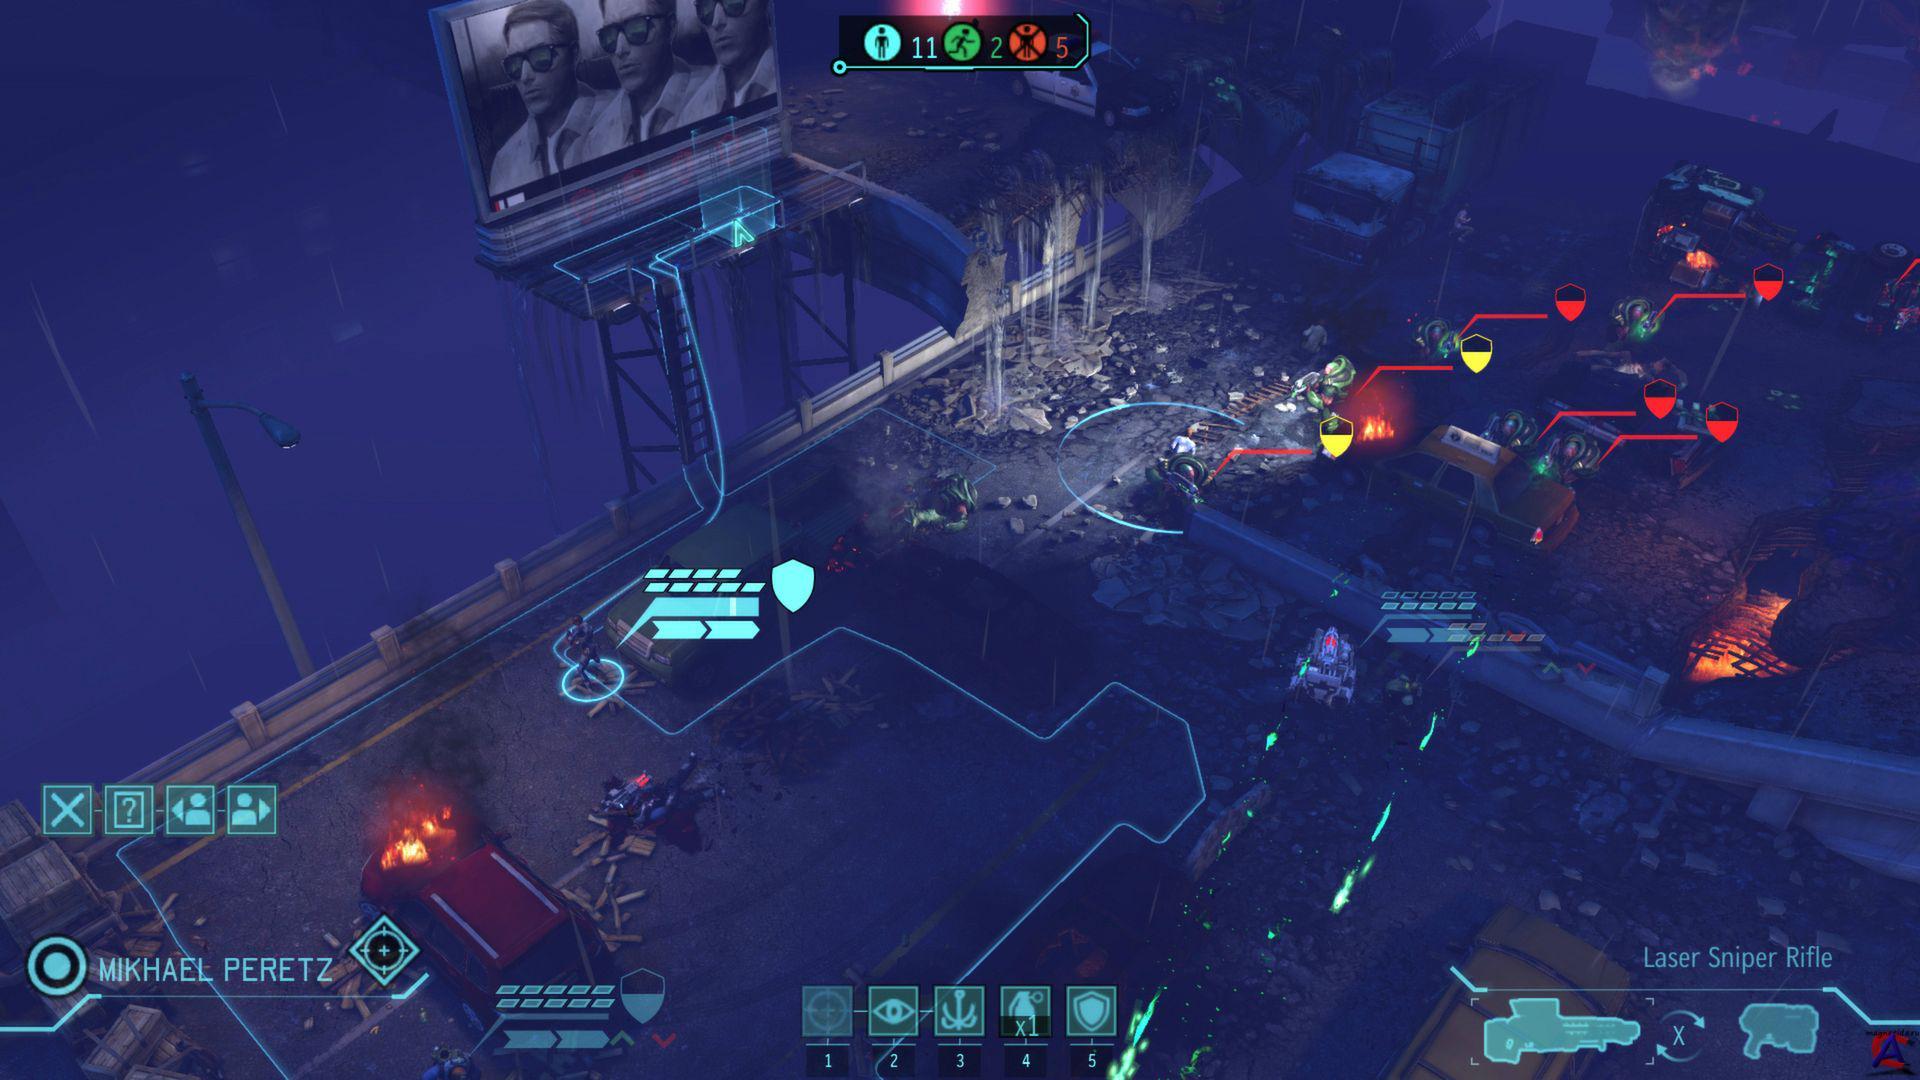 XCOM Enemy Unknown скачать на сайте newgames.com.ua.